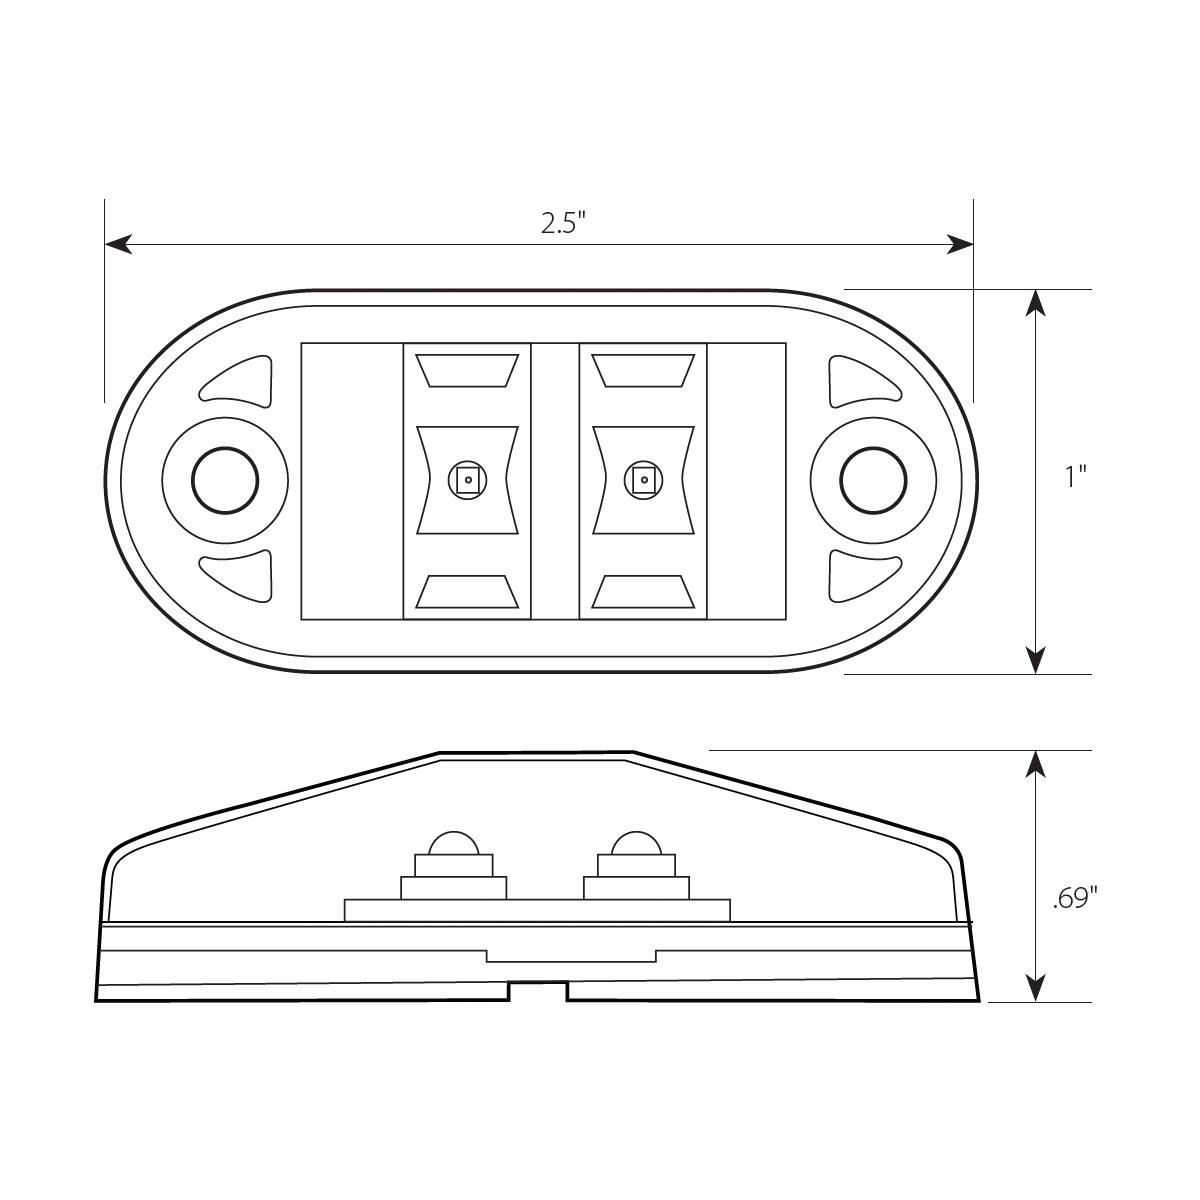 Small Oval LED Marker Light - Diagram